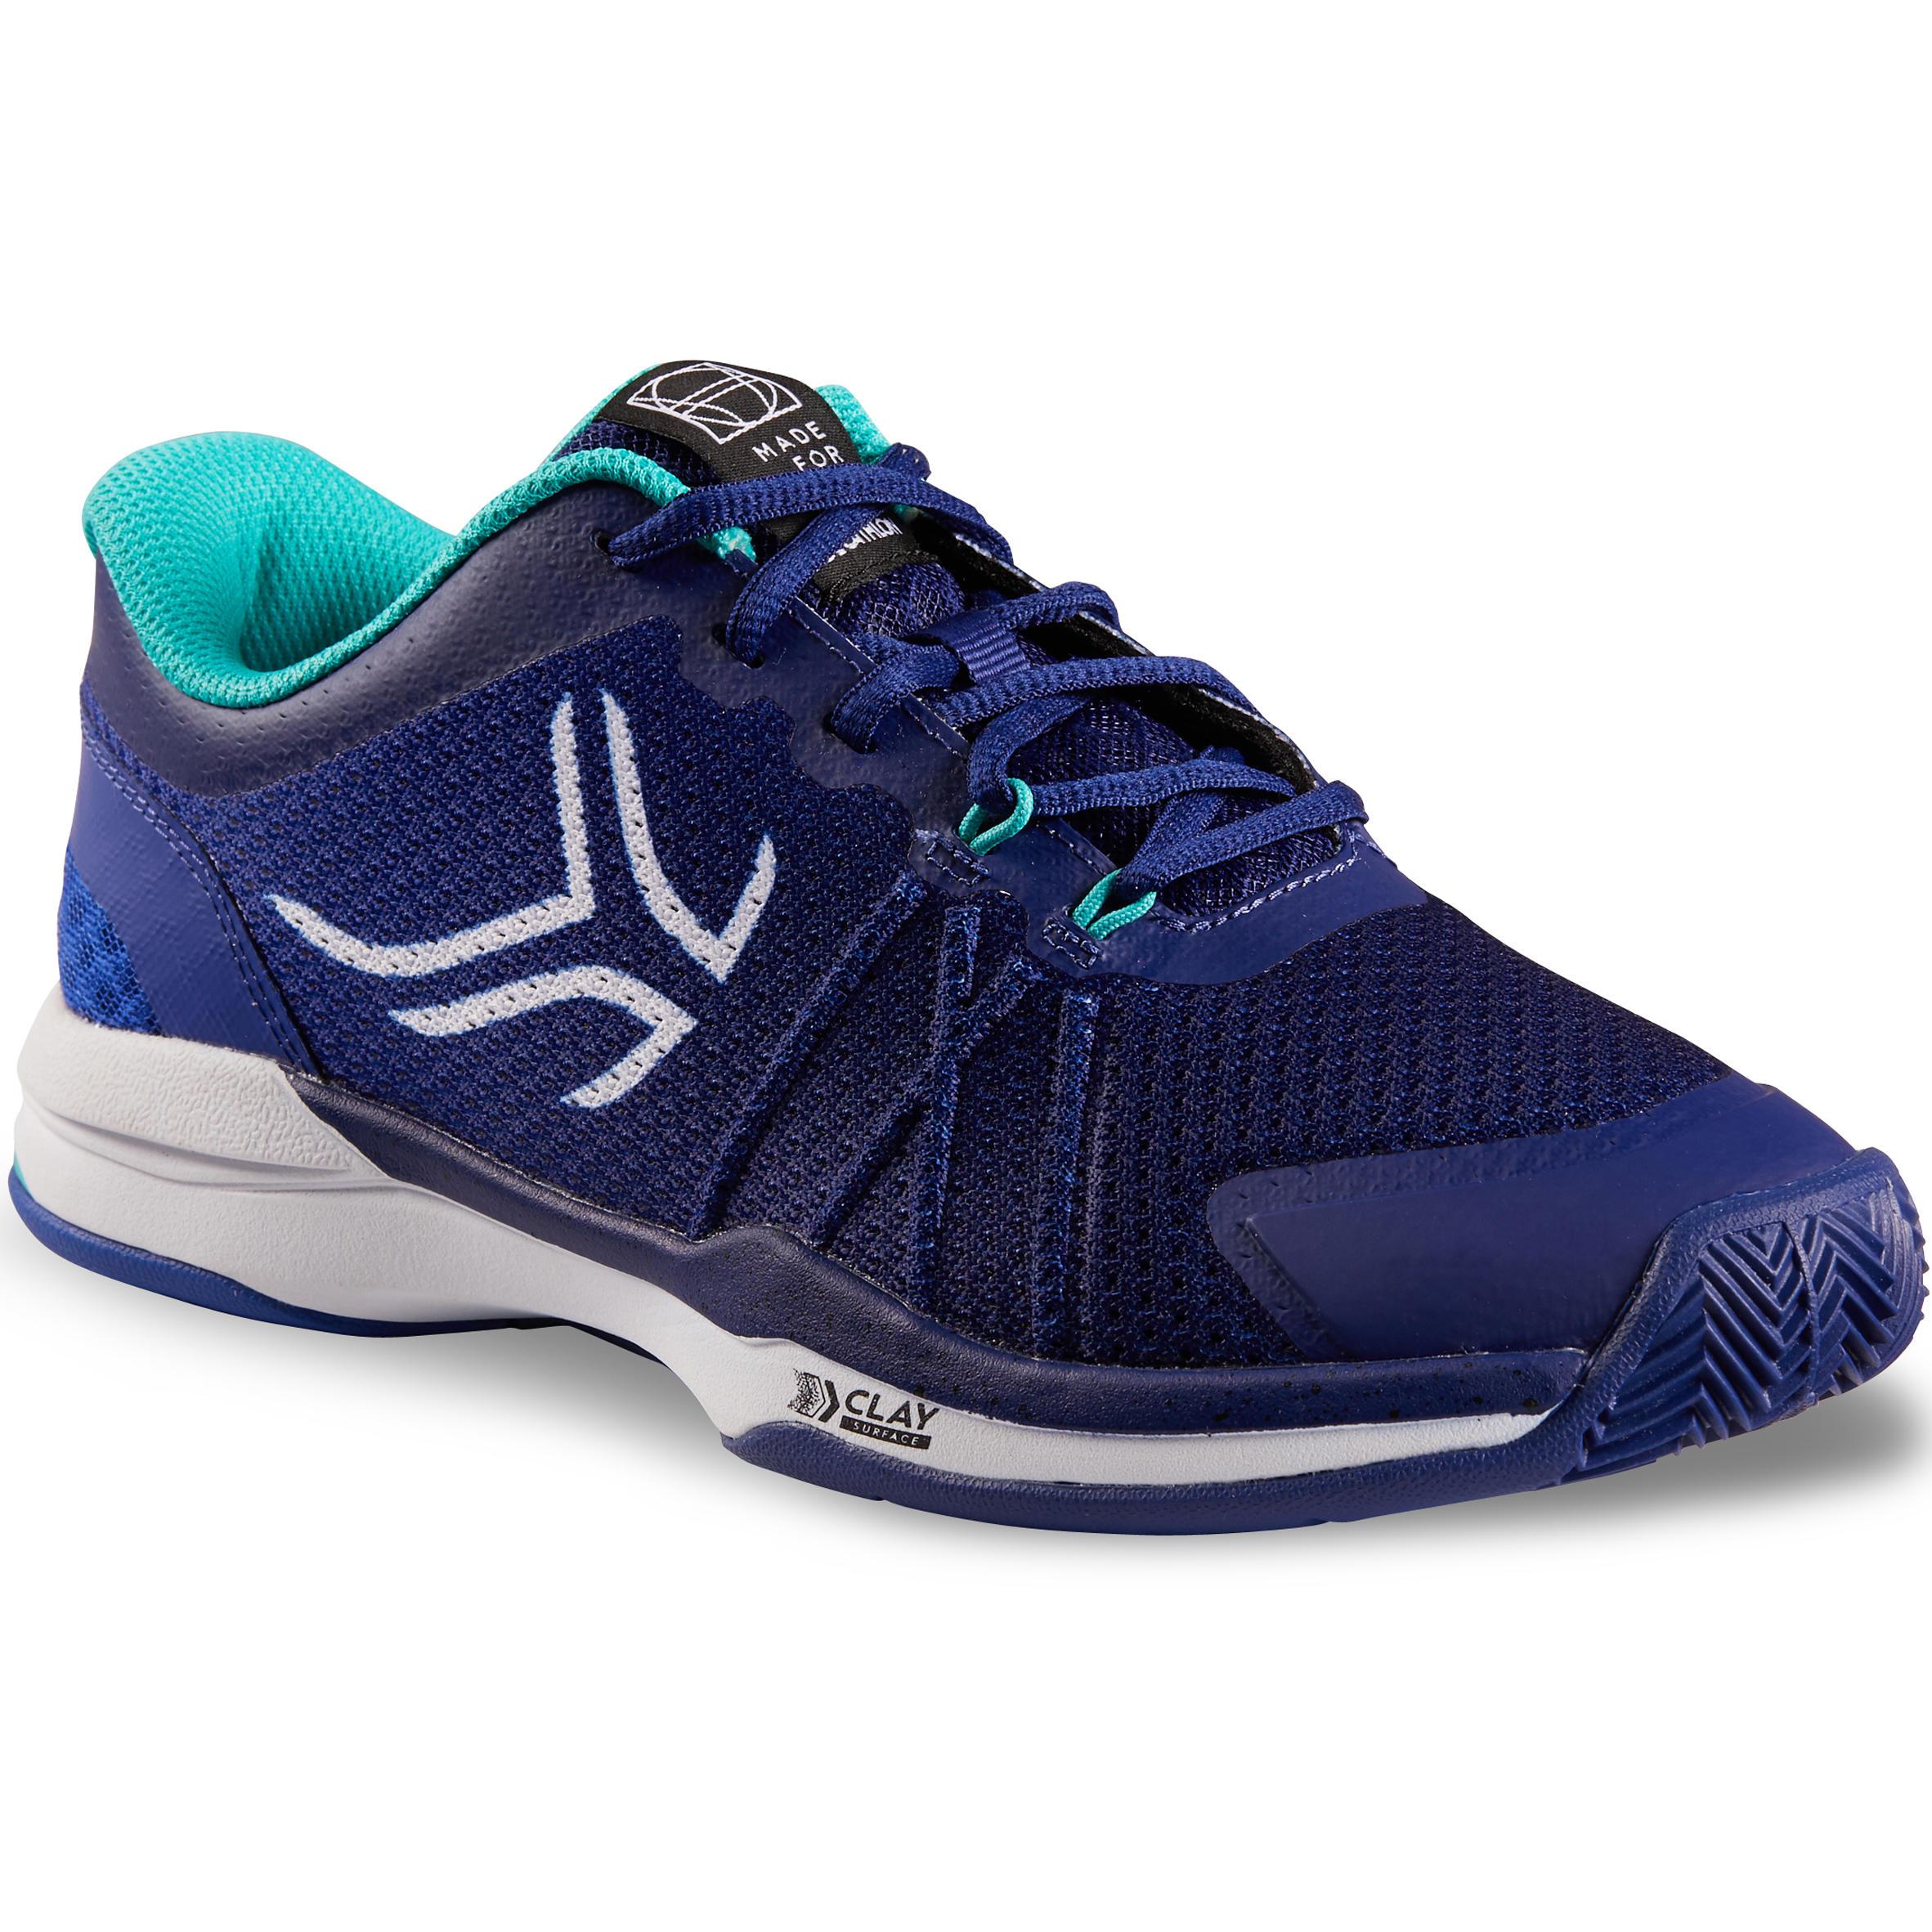 Tennisschuhe TS 590 Damen blau | Schuhe > Sportschuhe > Tennisschuhe | Artengo